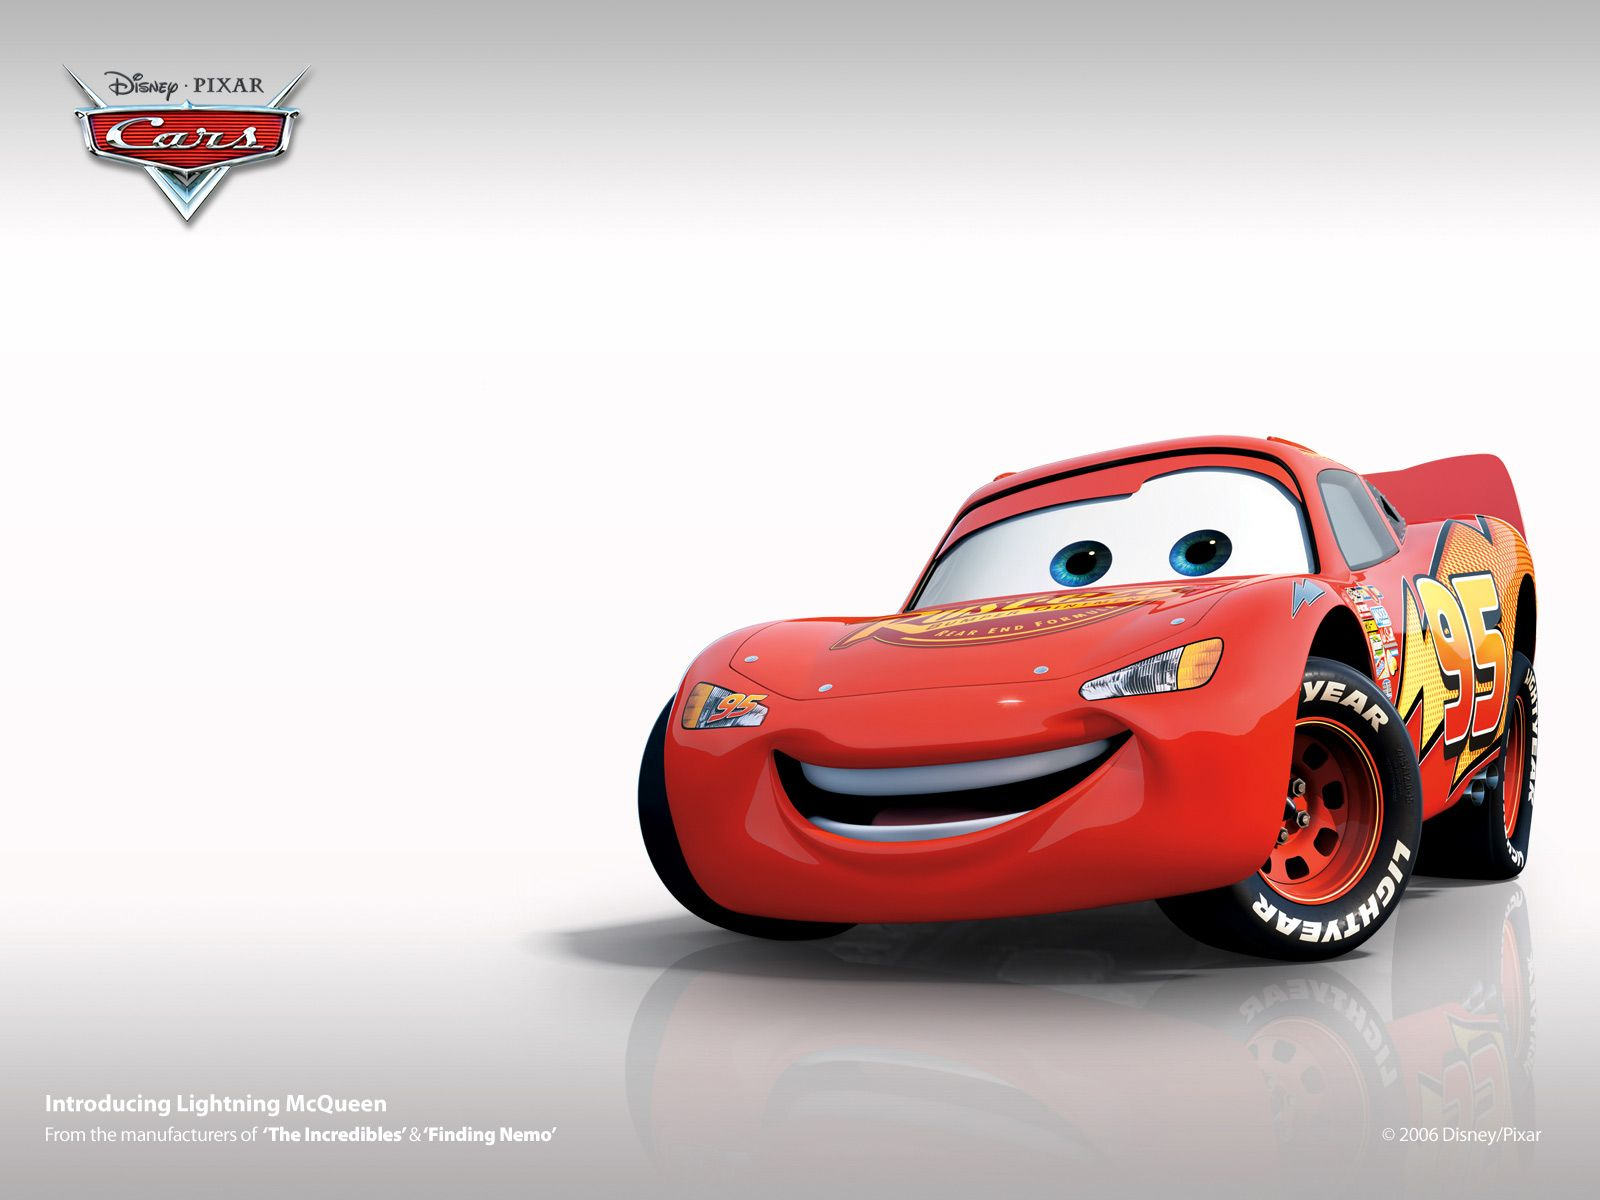 Lightning Mcqueen For Desktop Hd Desktop Wallpaper Instagram Photo Background Image Disney Cars Wallpaper Cars Movie Disney Cars